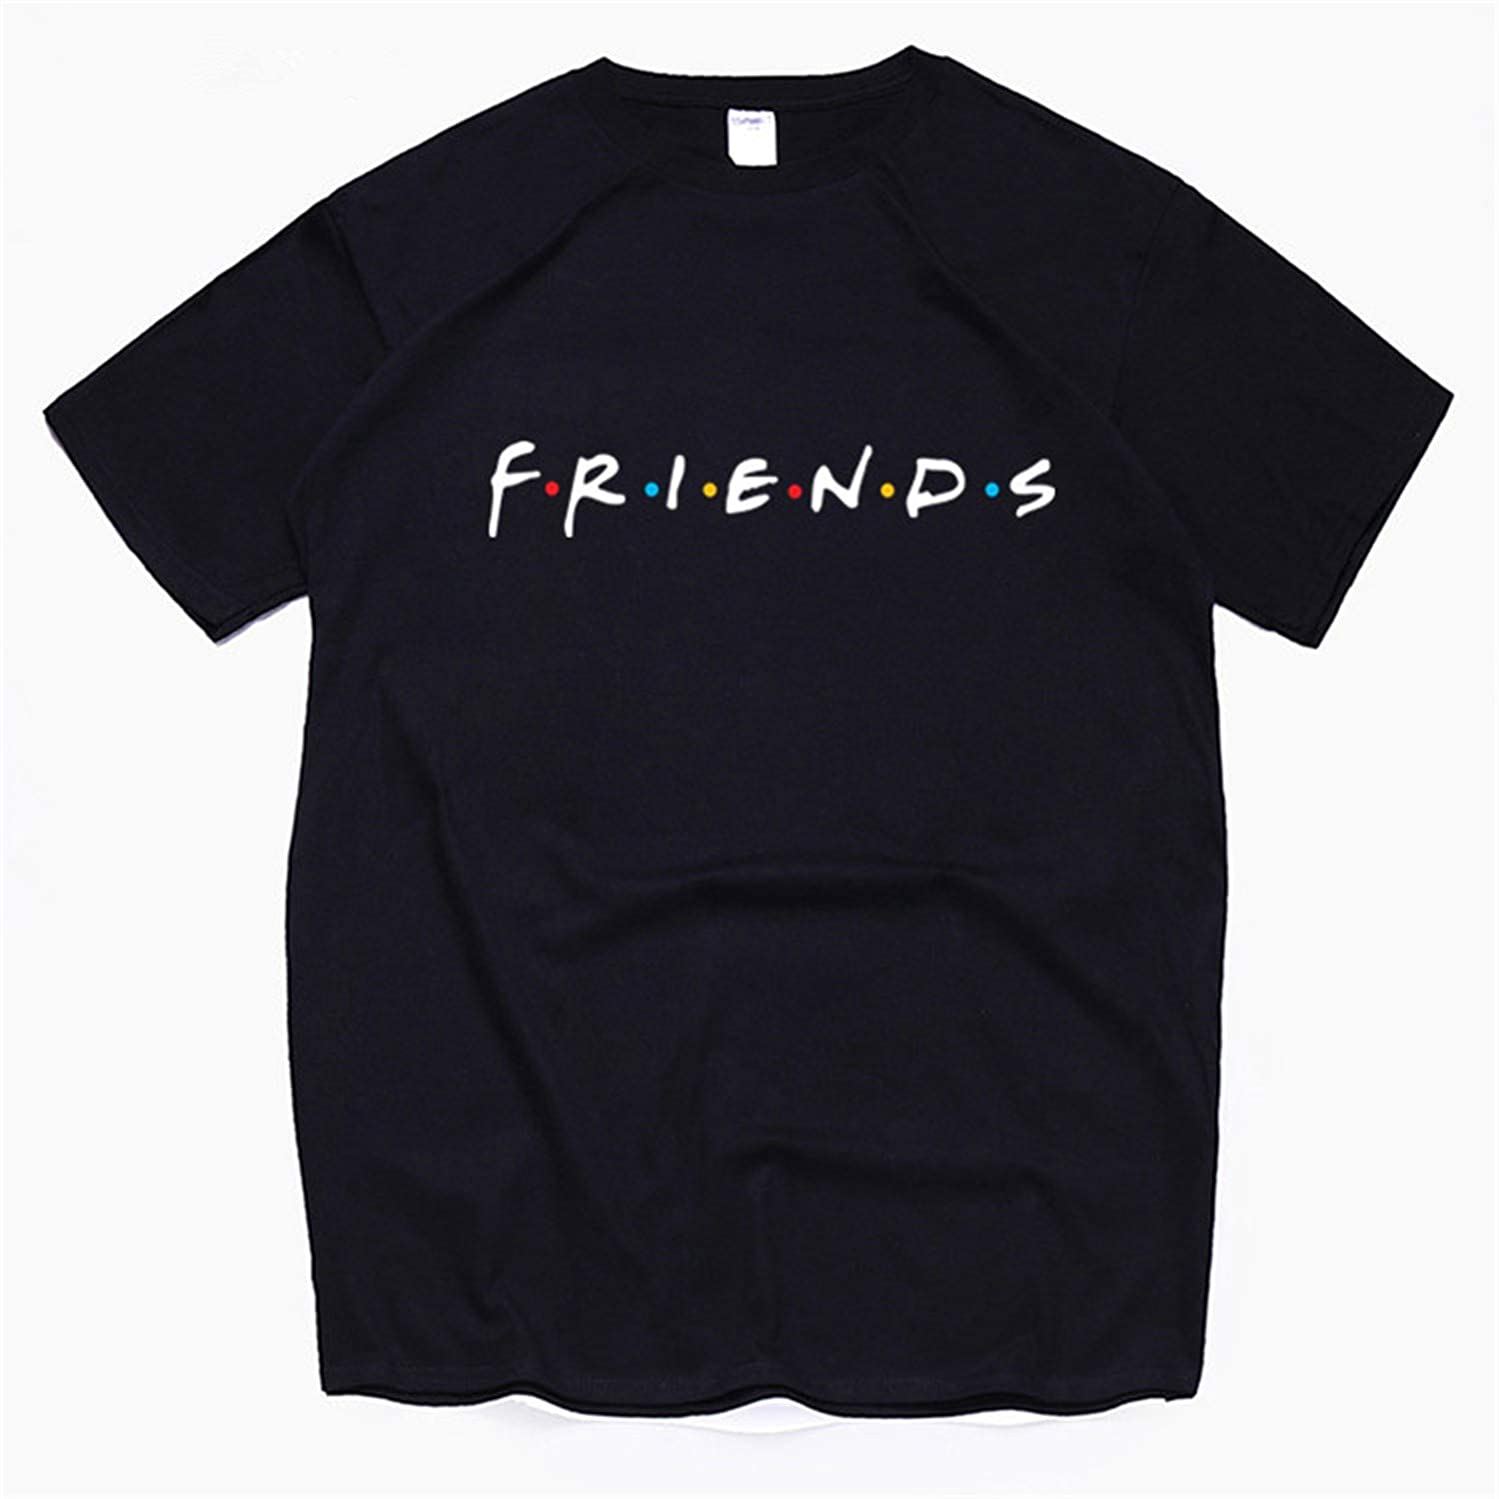 Micca Bacain Men Shirt Men's Tv Funny Cotton T Shirts Unisex Summer Workout Tshirts Women Hip Hop Tops Boyfriend Gift